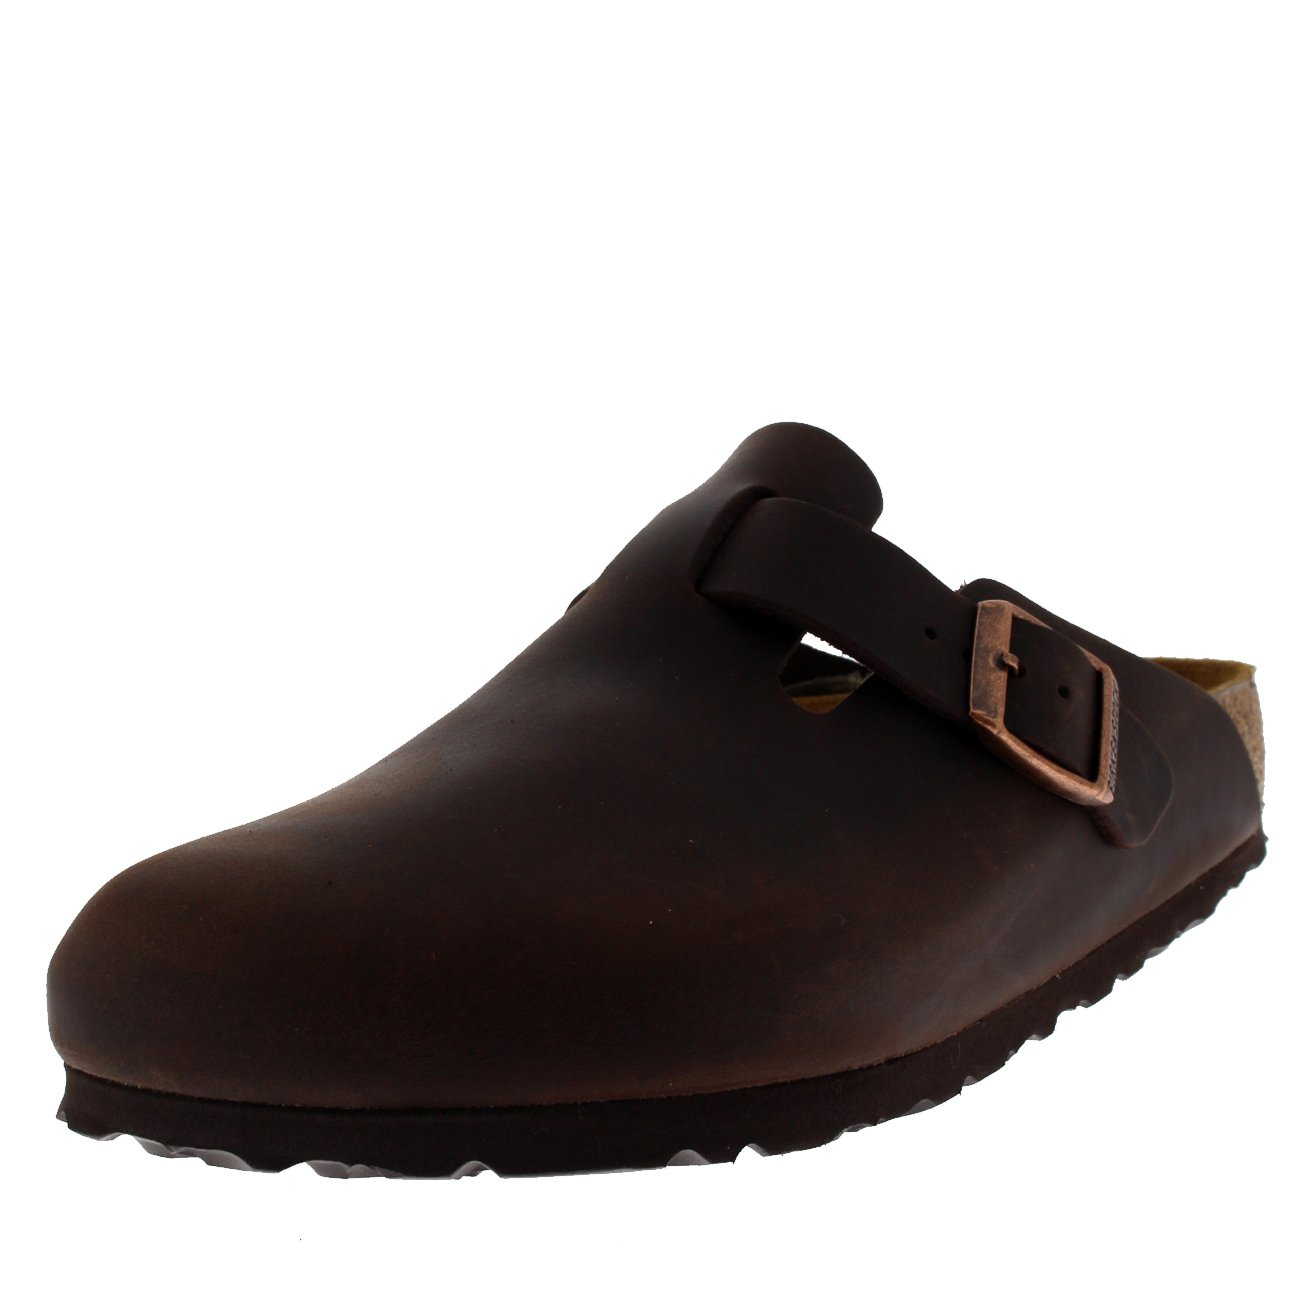 Womens Birkentstock Boston Casual Waxy Leather Sandals Holiday Clogs - Waxy Habana - 11 by Birkenstock